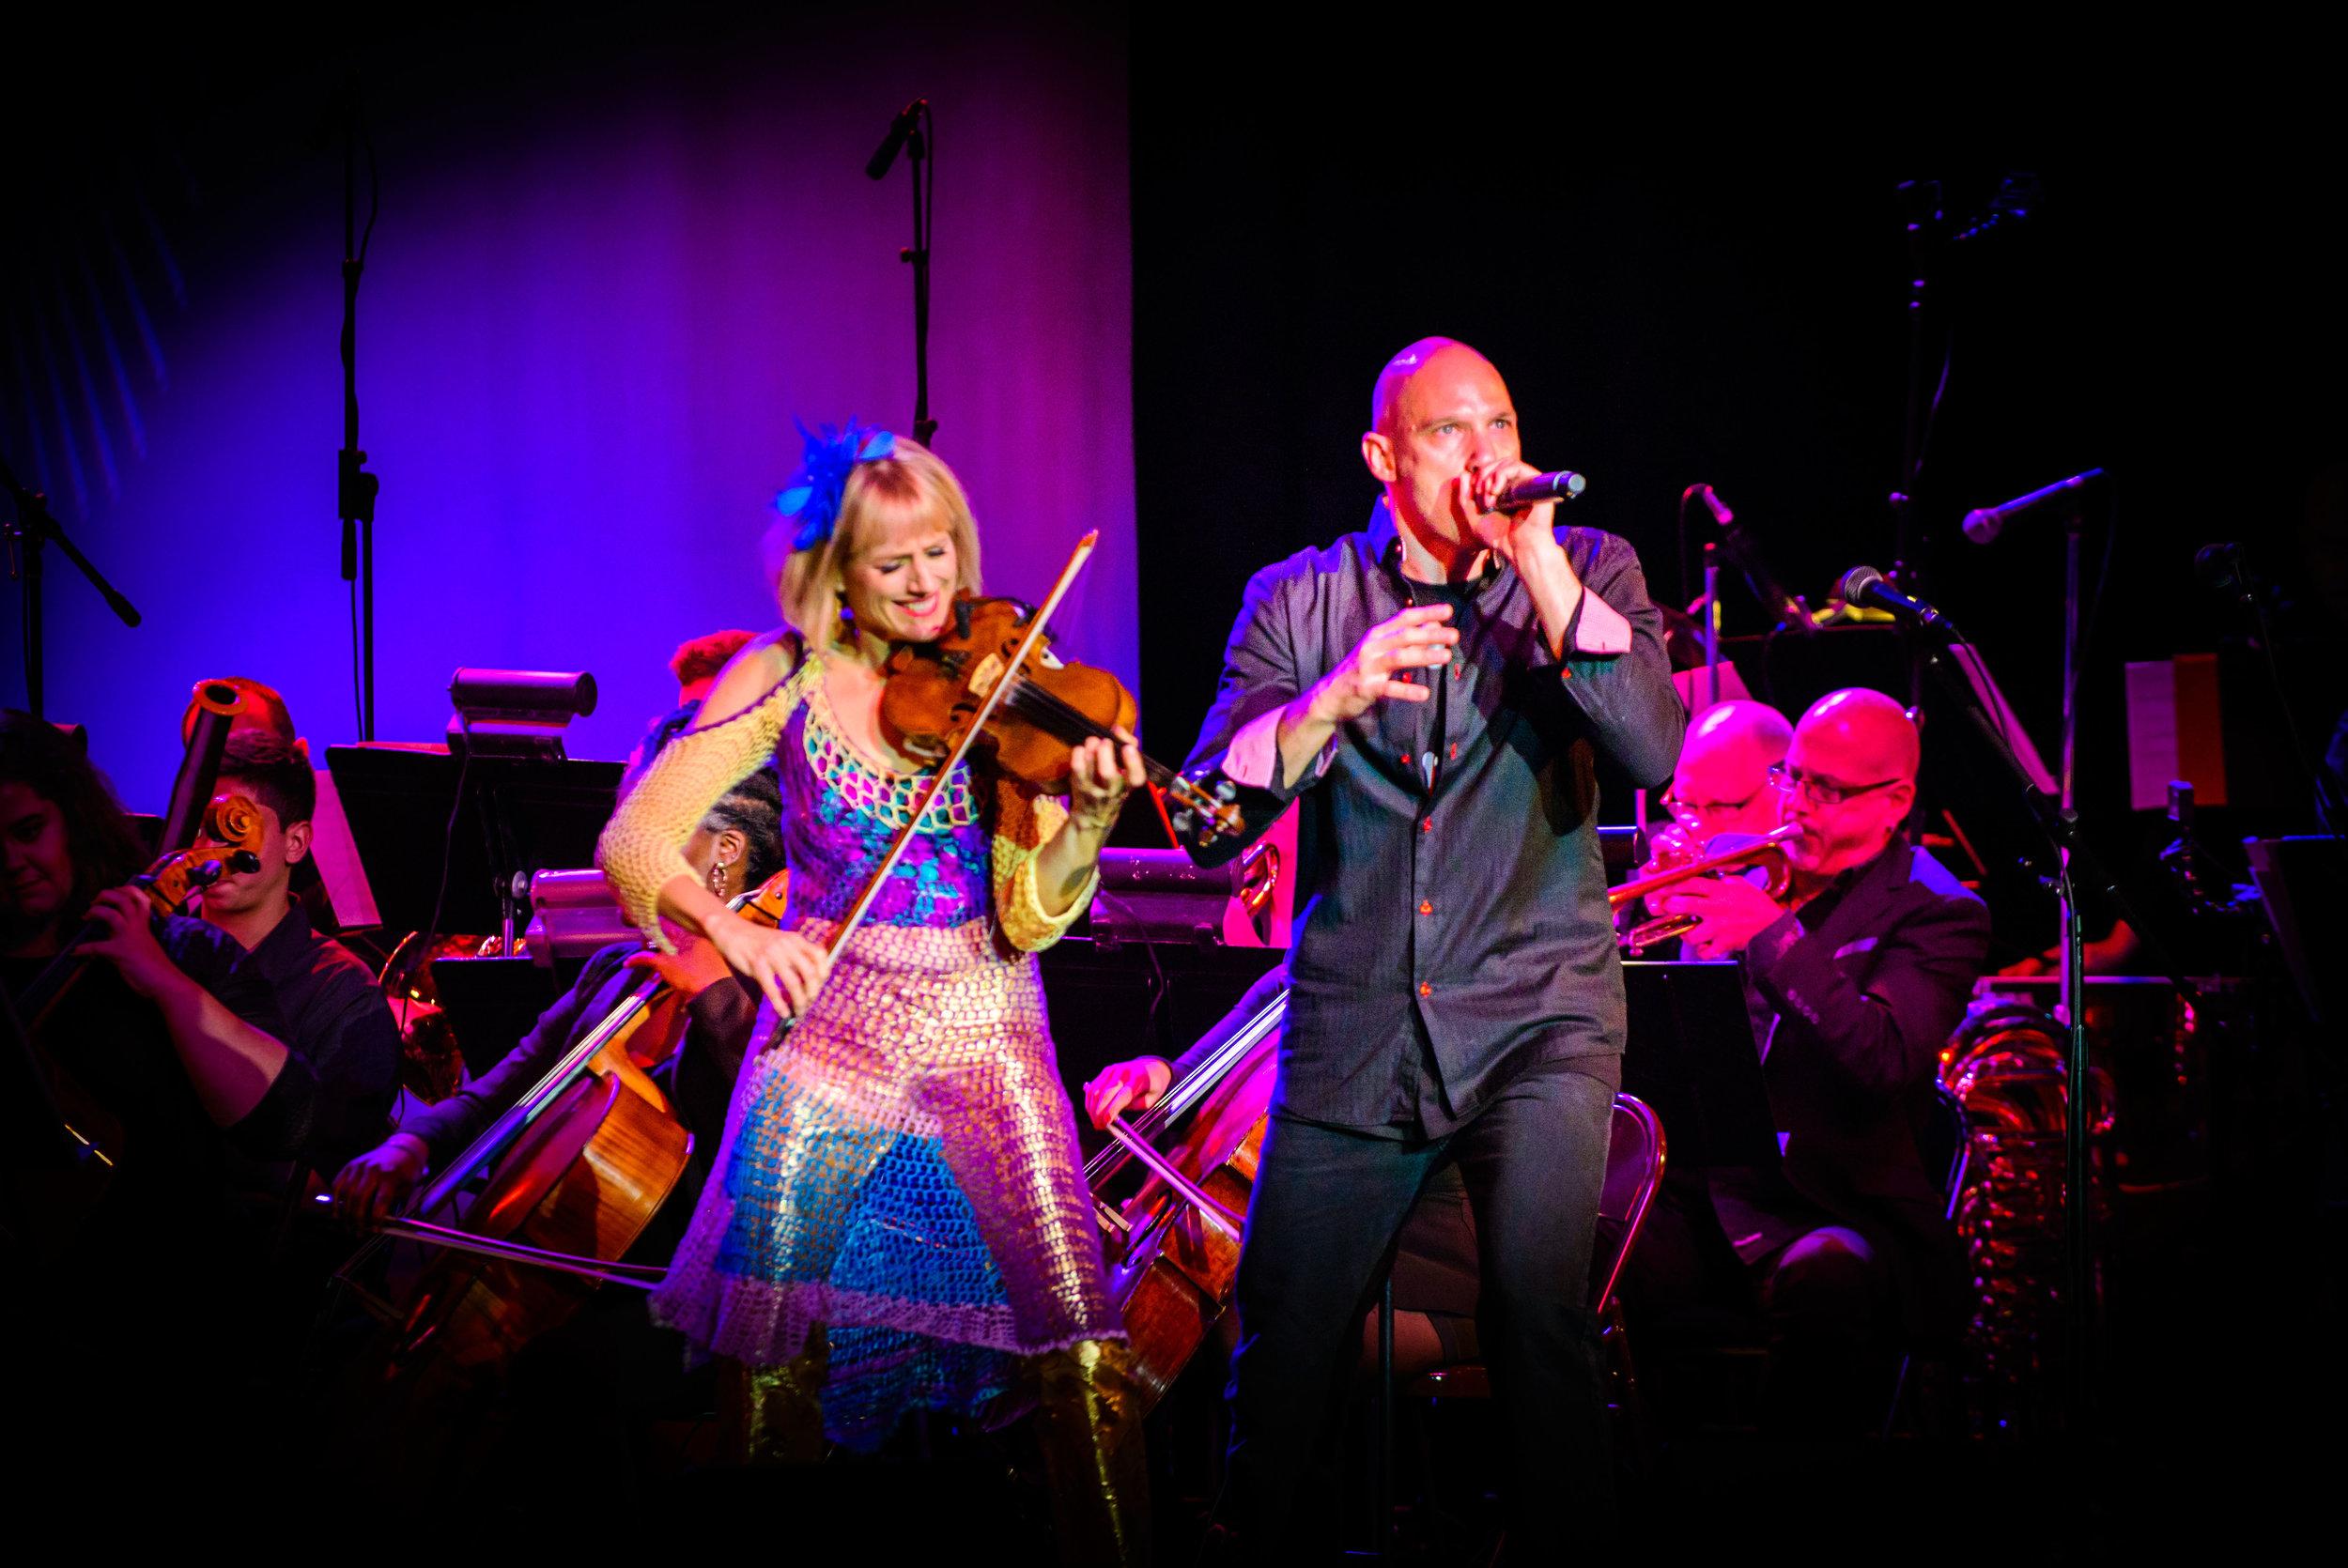 Michael Feigenbaum & Daisy Jopling Photo no 1, Photo Credit:  http://www.spontaneousbeauty.com